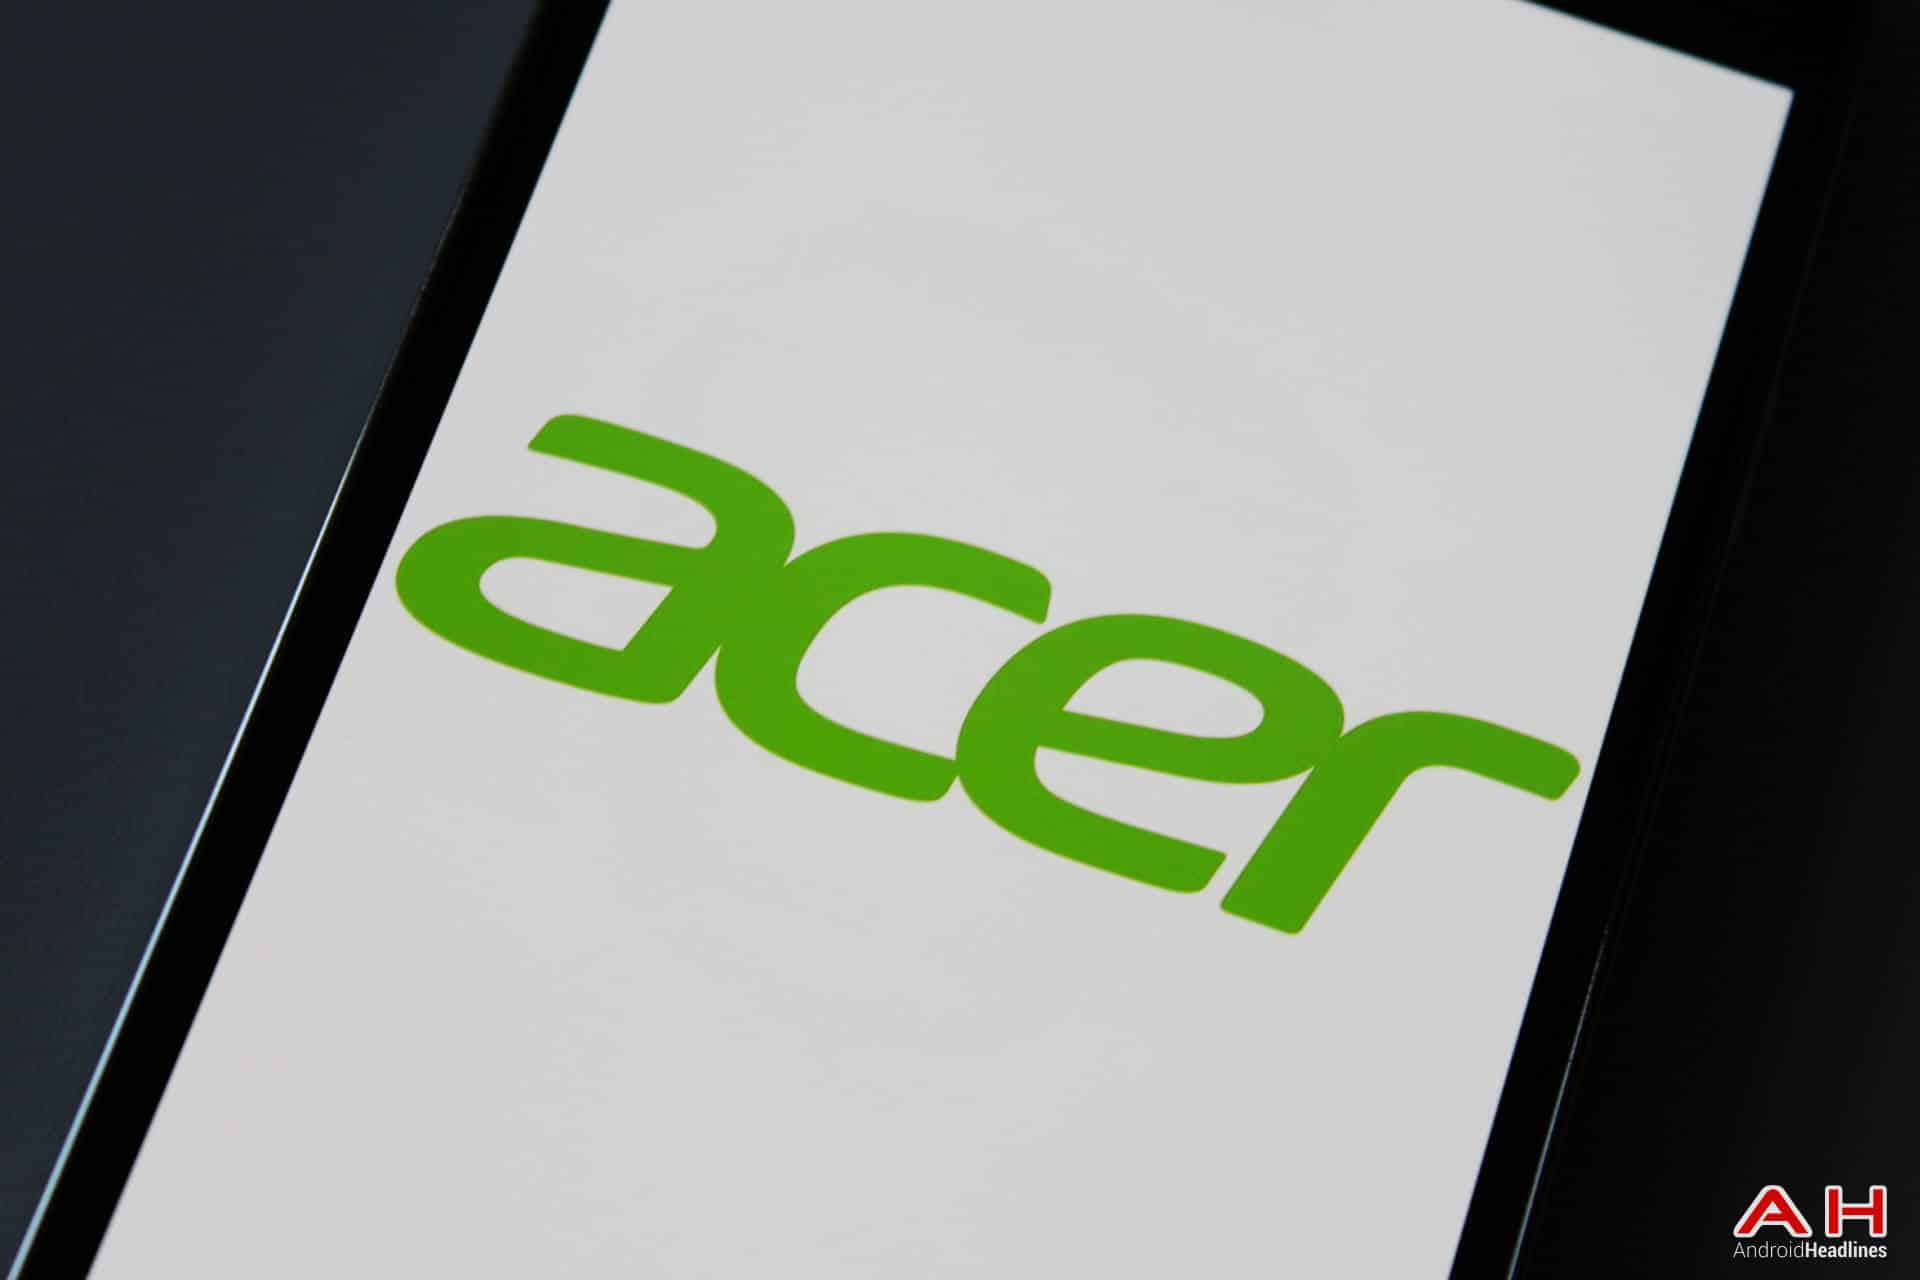 AH ACER Logo 1.3